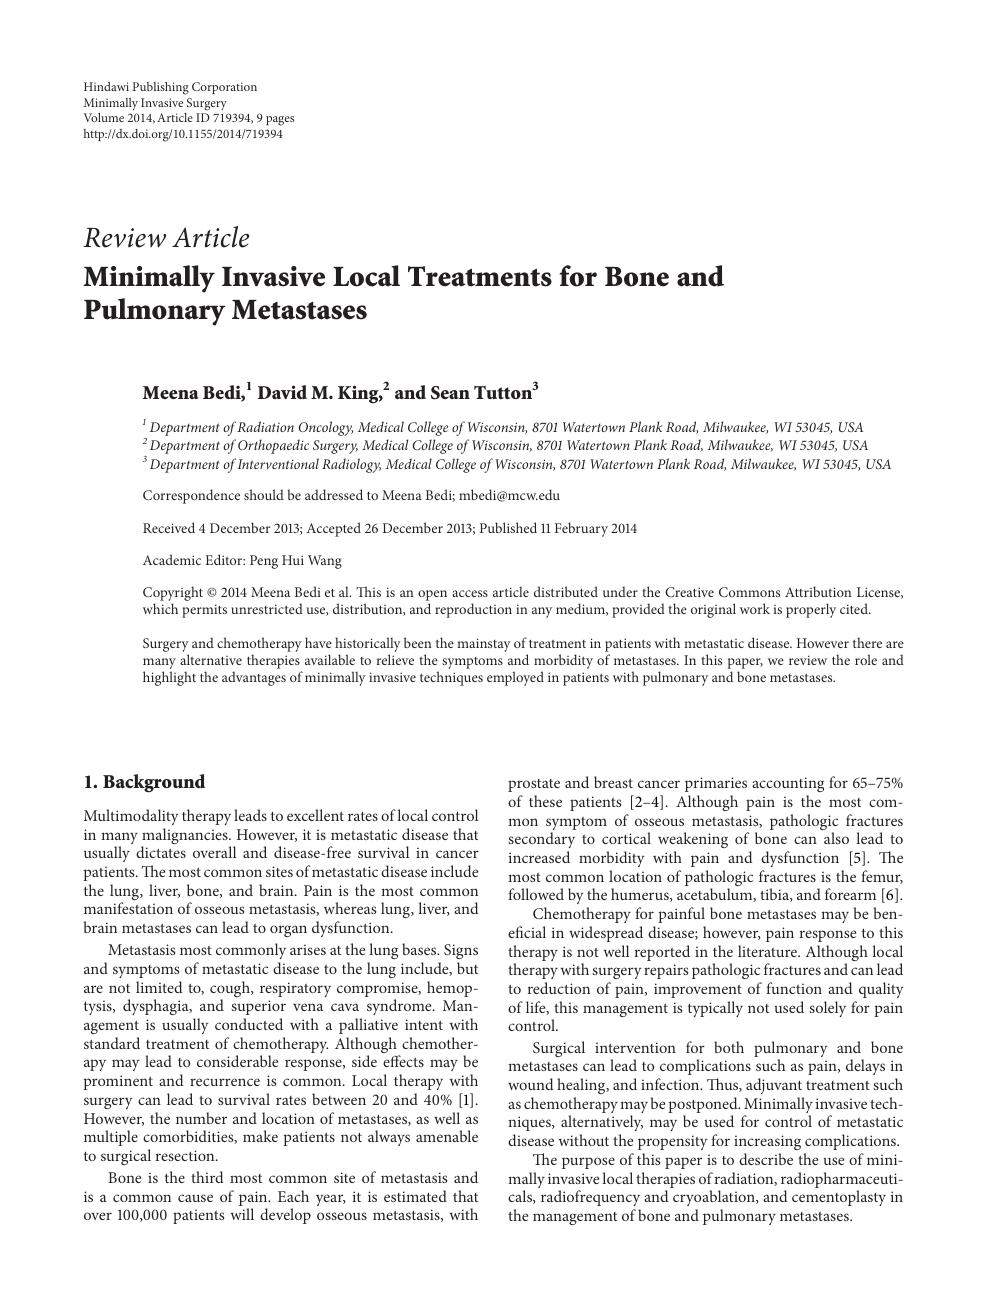 Minimally Invasive Local Treatments for Bone and Pulmonary